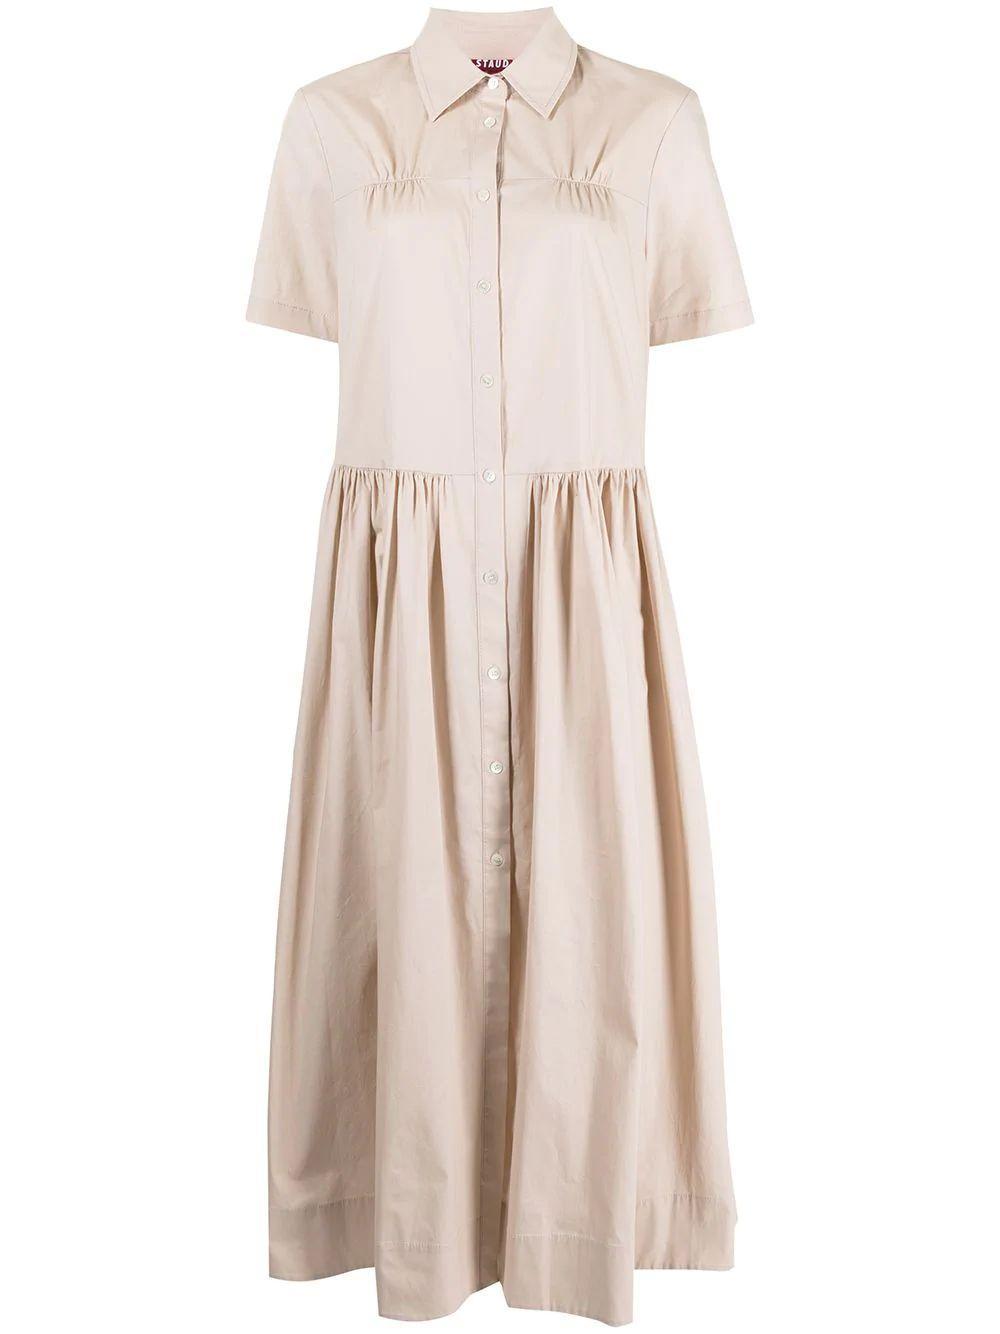 Guilia Maxi Shirt Dress Item # 90-7463